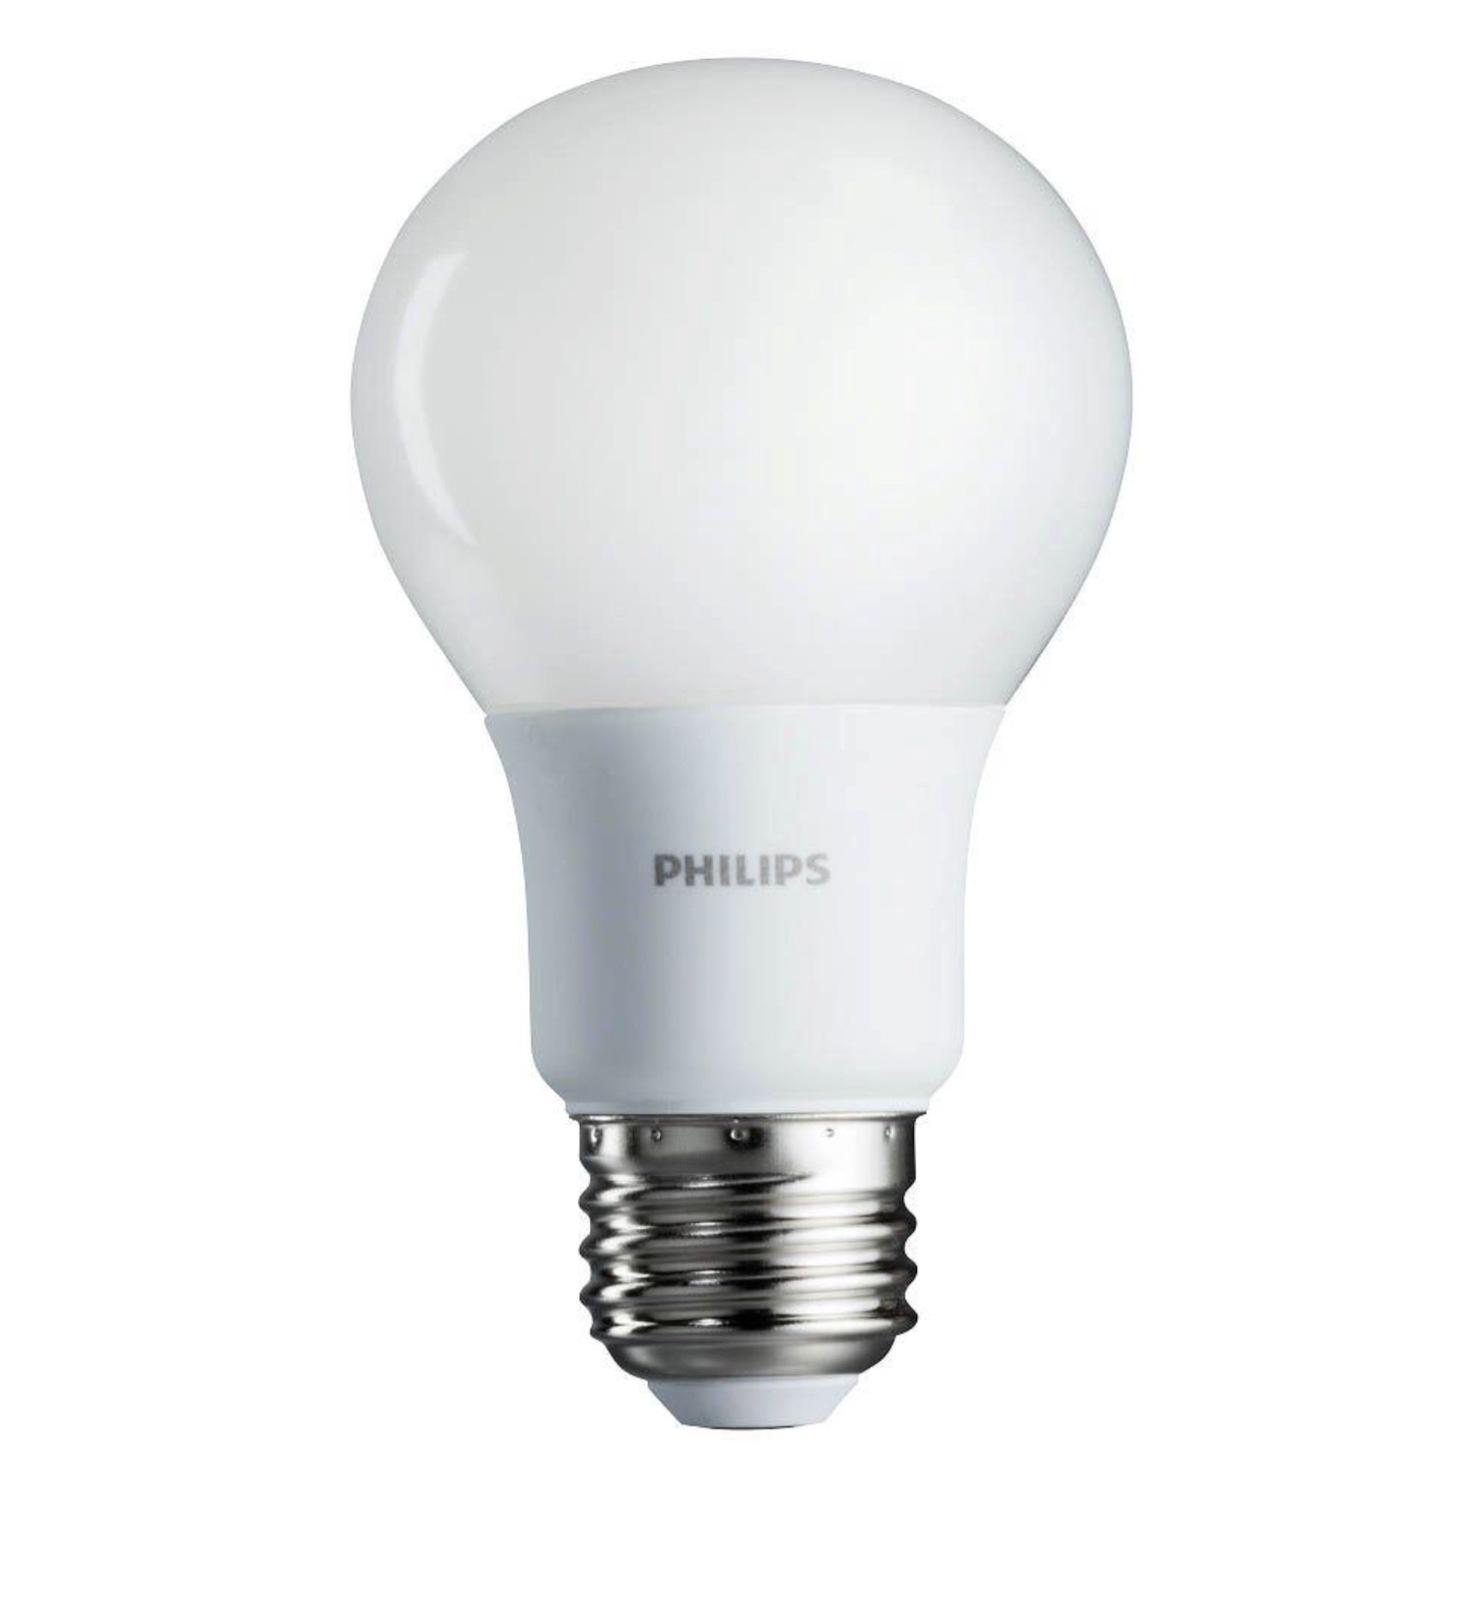 Philips 40w equivalent soft white a19 and 50 similar items philips 40w equivalent soft white a19 non dimmable led household light 4 bulb arubaitofo Choice Image